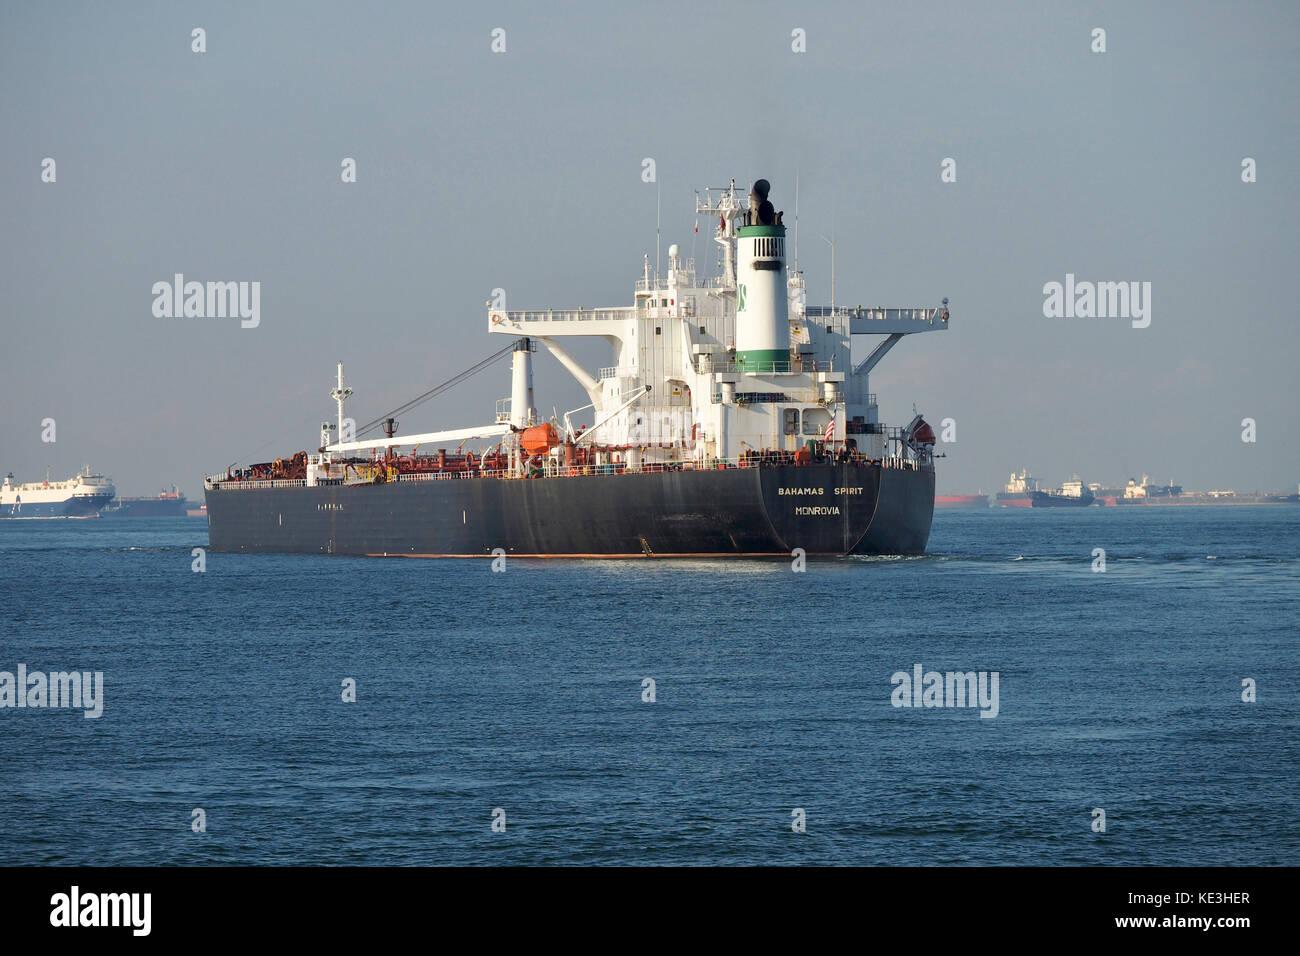 Liberia flagged Crude Oil Tanker, Bahamas Spirit Monrovia, cruising through Singapore Straits - Stock Image